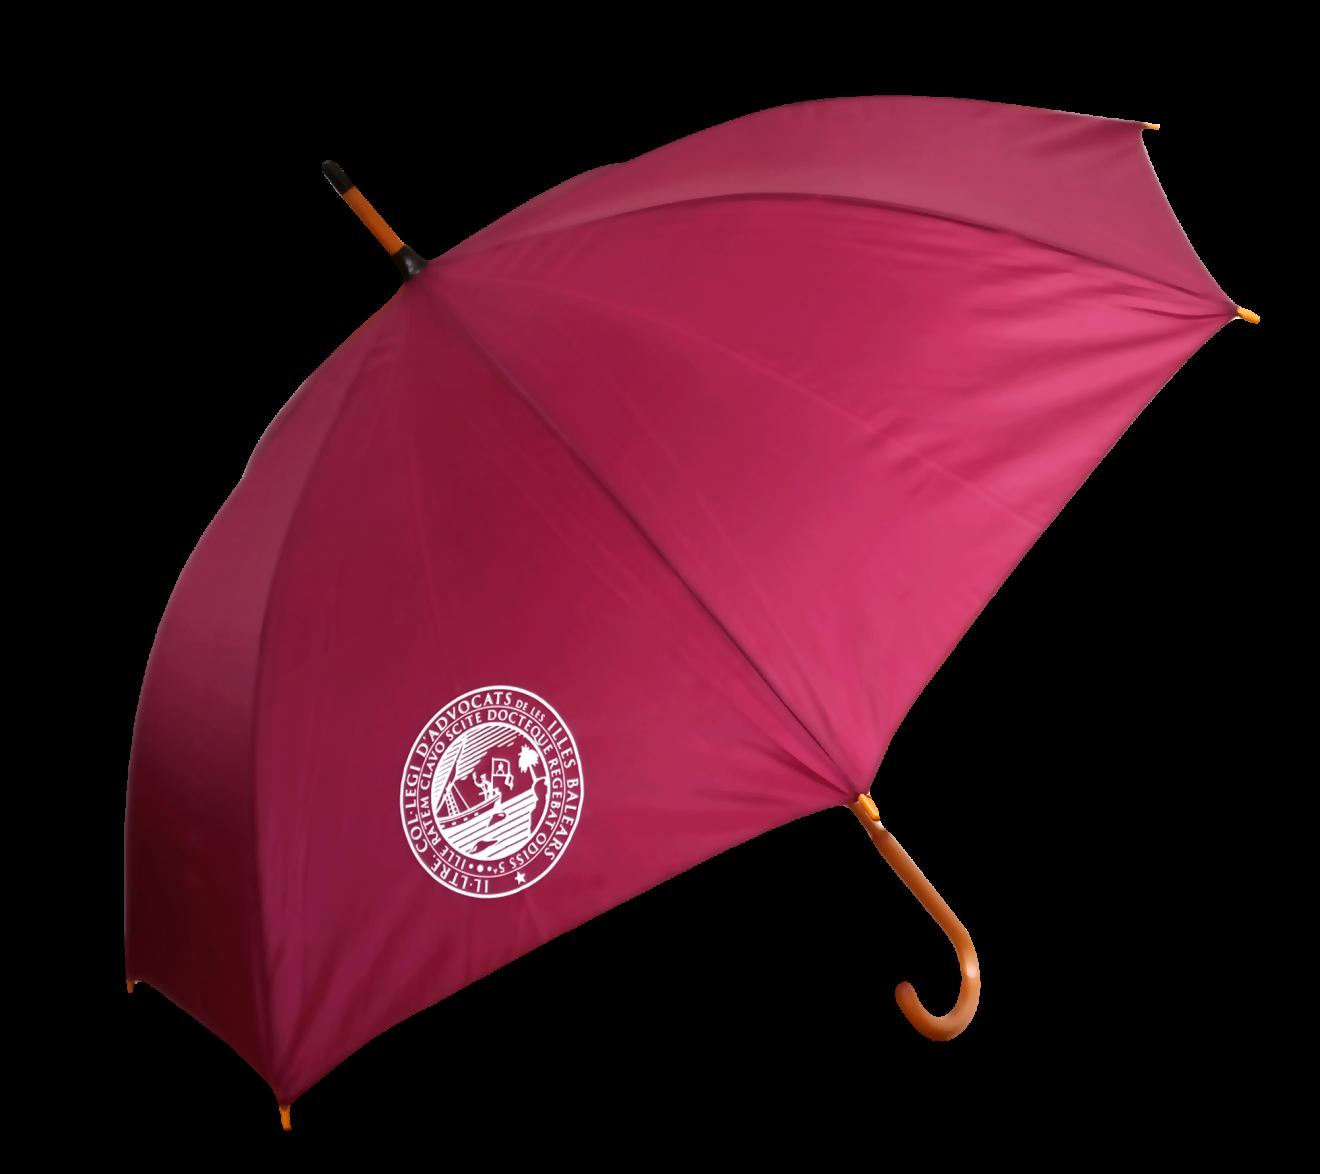 Resguárdate de la lluvia con el paraguas del ICAIB